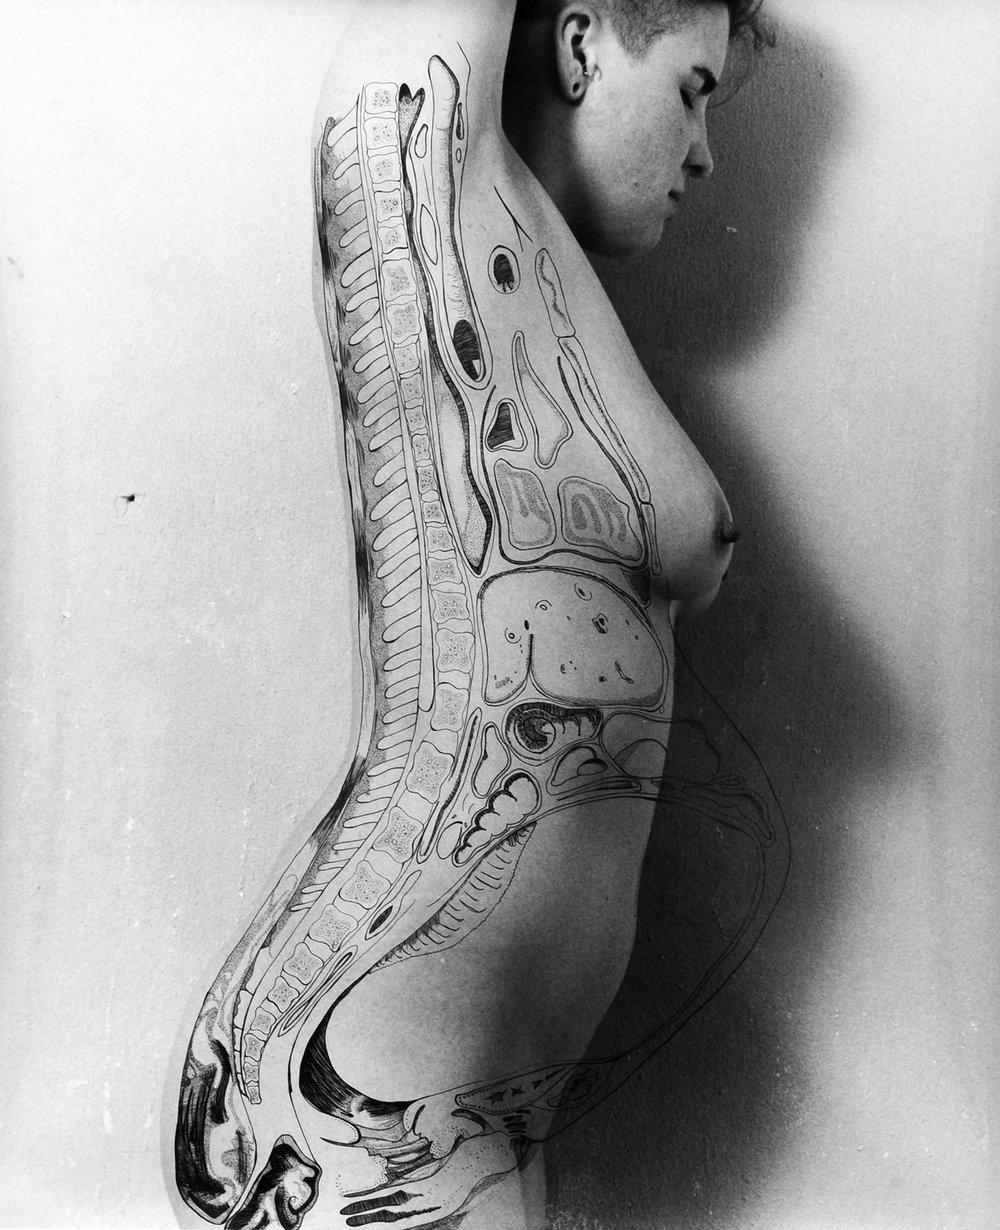 """Angela, Gestation"". 2011. 16x20. Silver Gelatin with Ink Overlay."